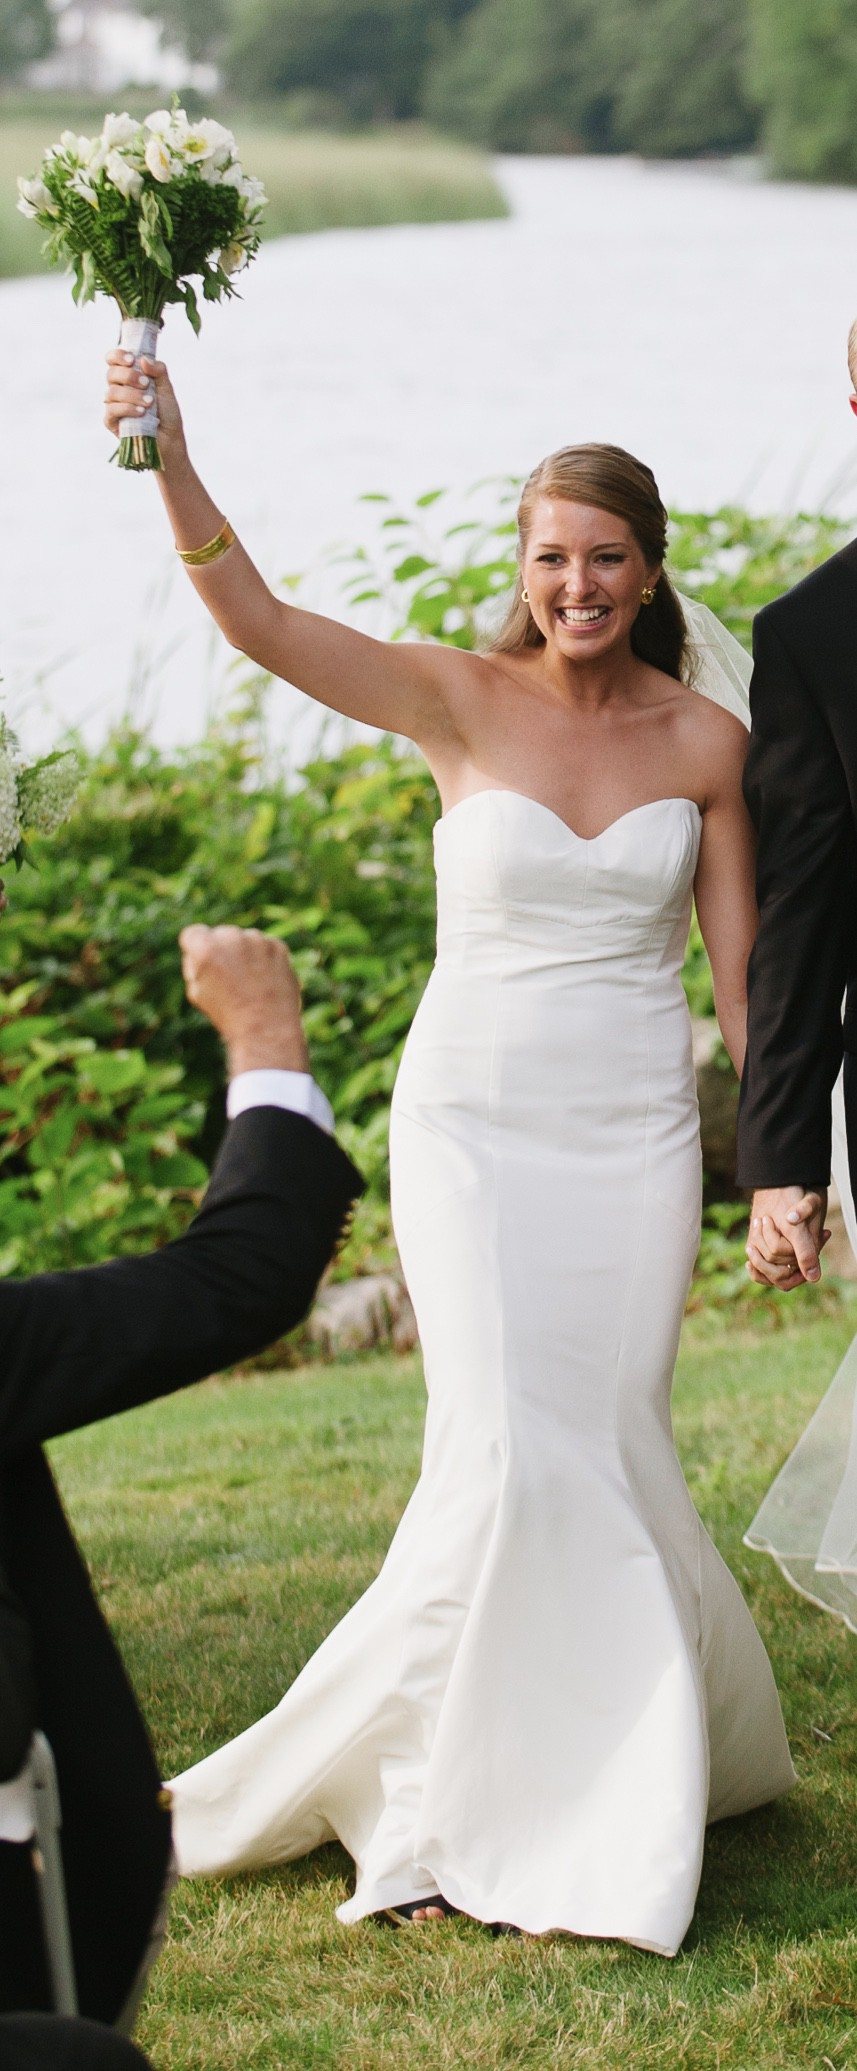 Nicole Miller Dakota Preowned Wedding